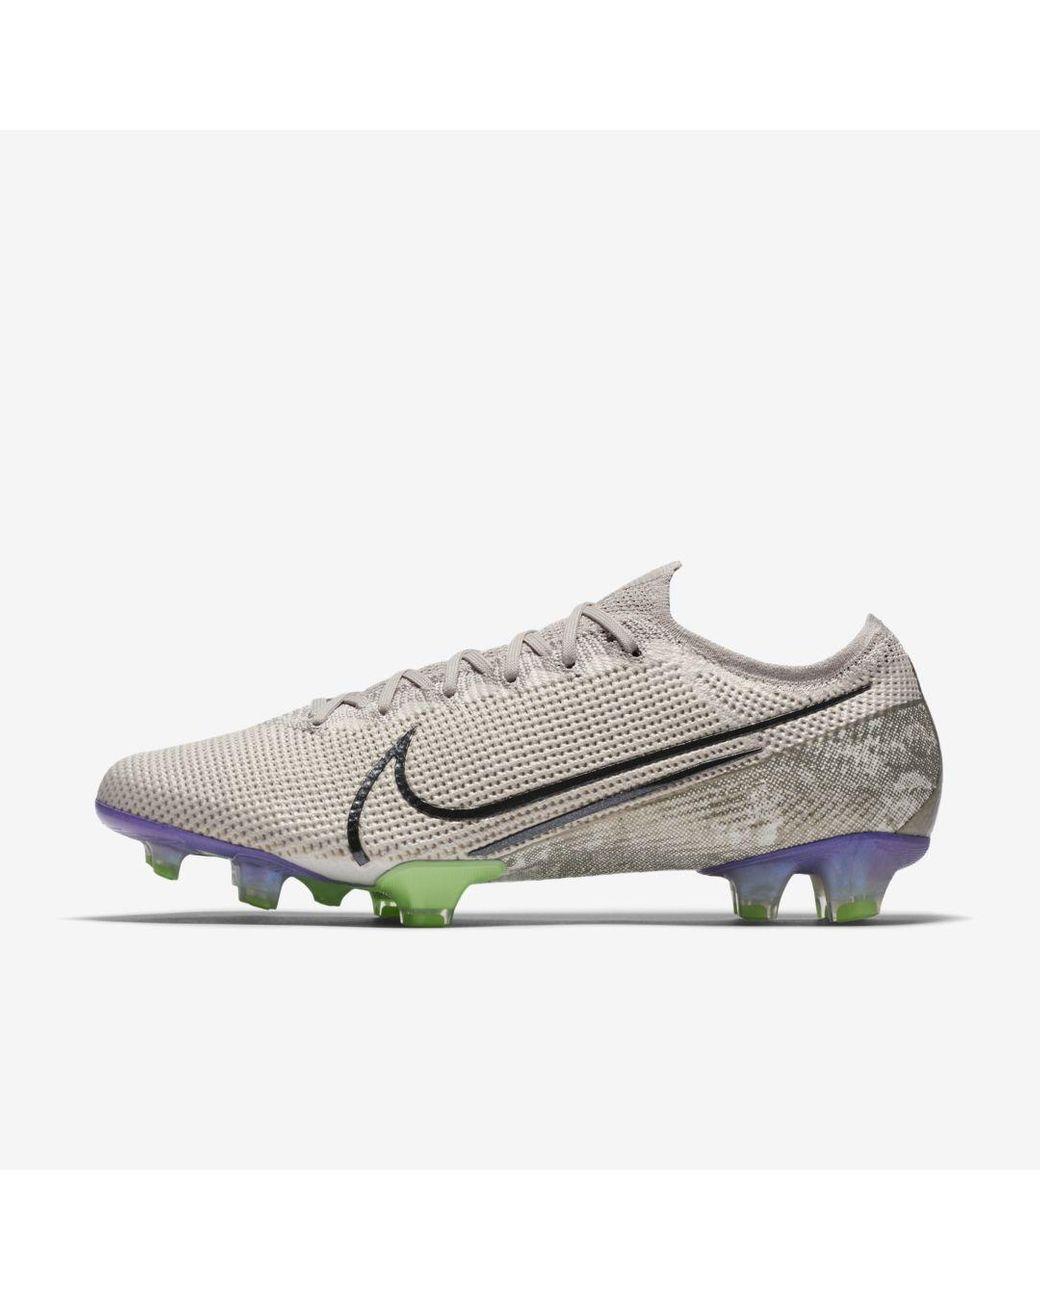 Nike Mercurial Vapor 13 Elite MDS FG Soccer Cleats